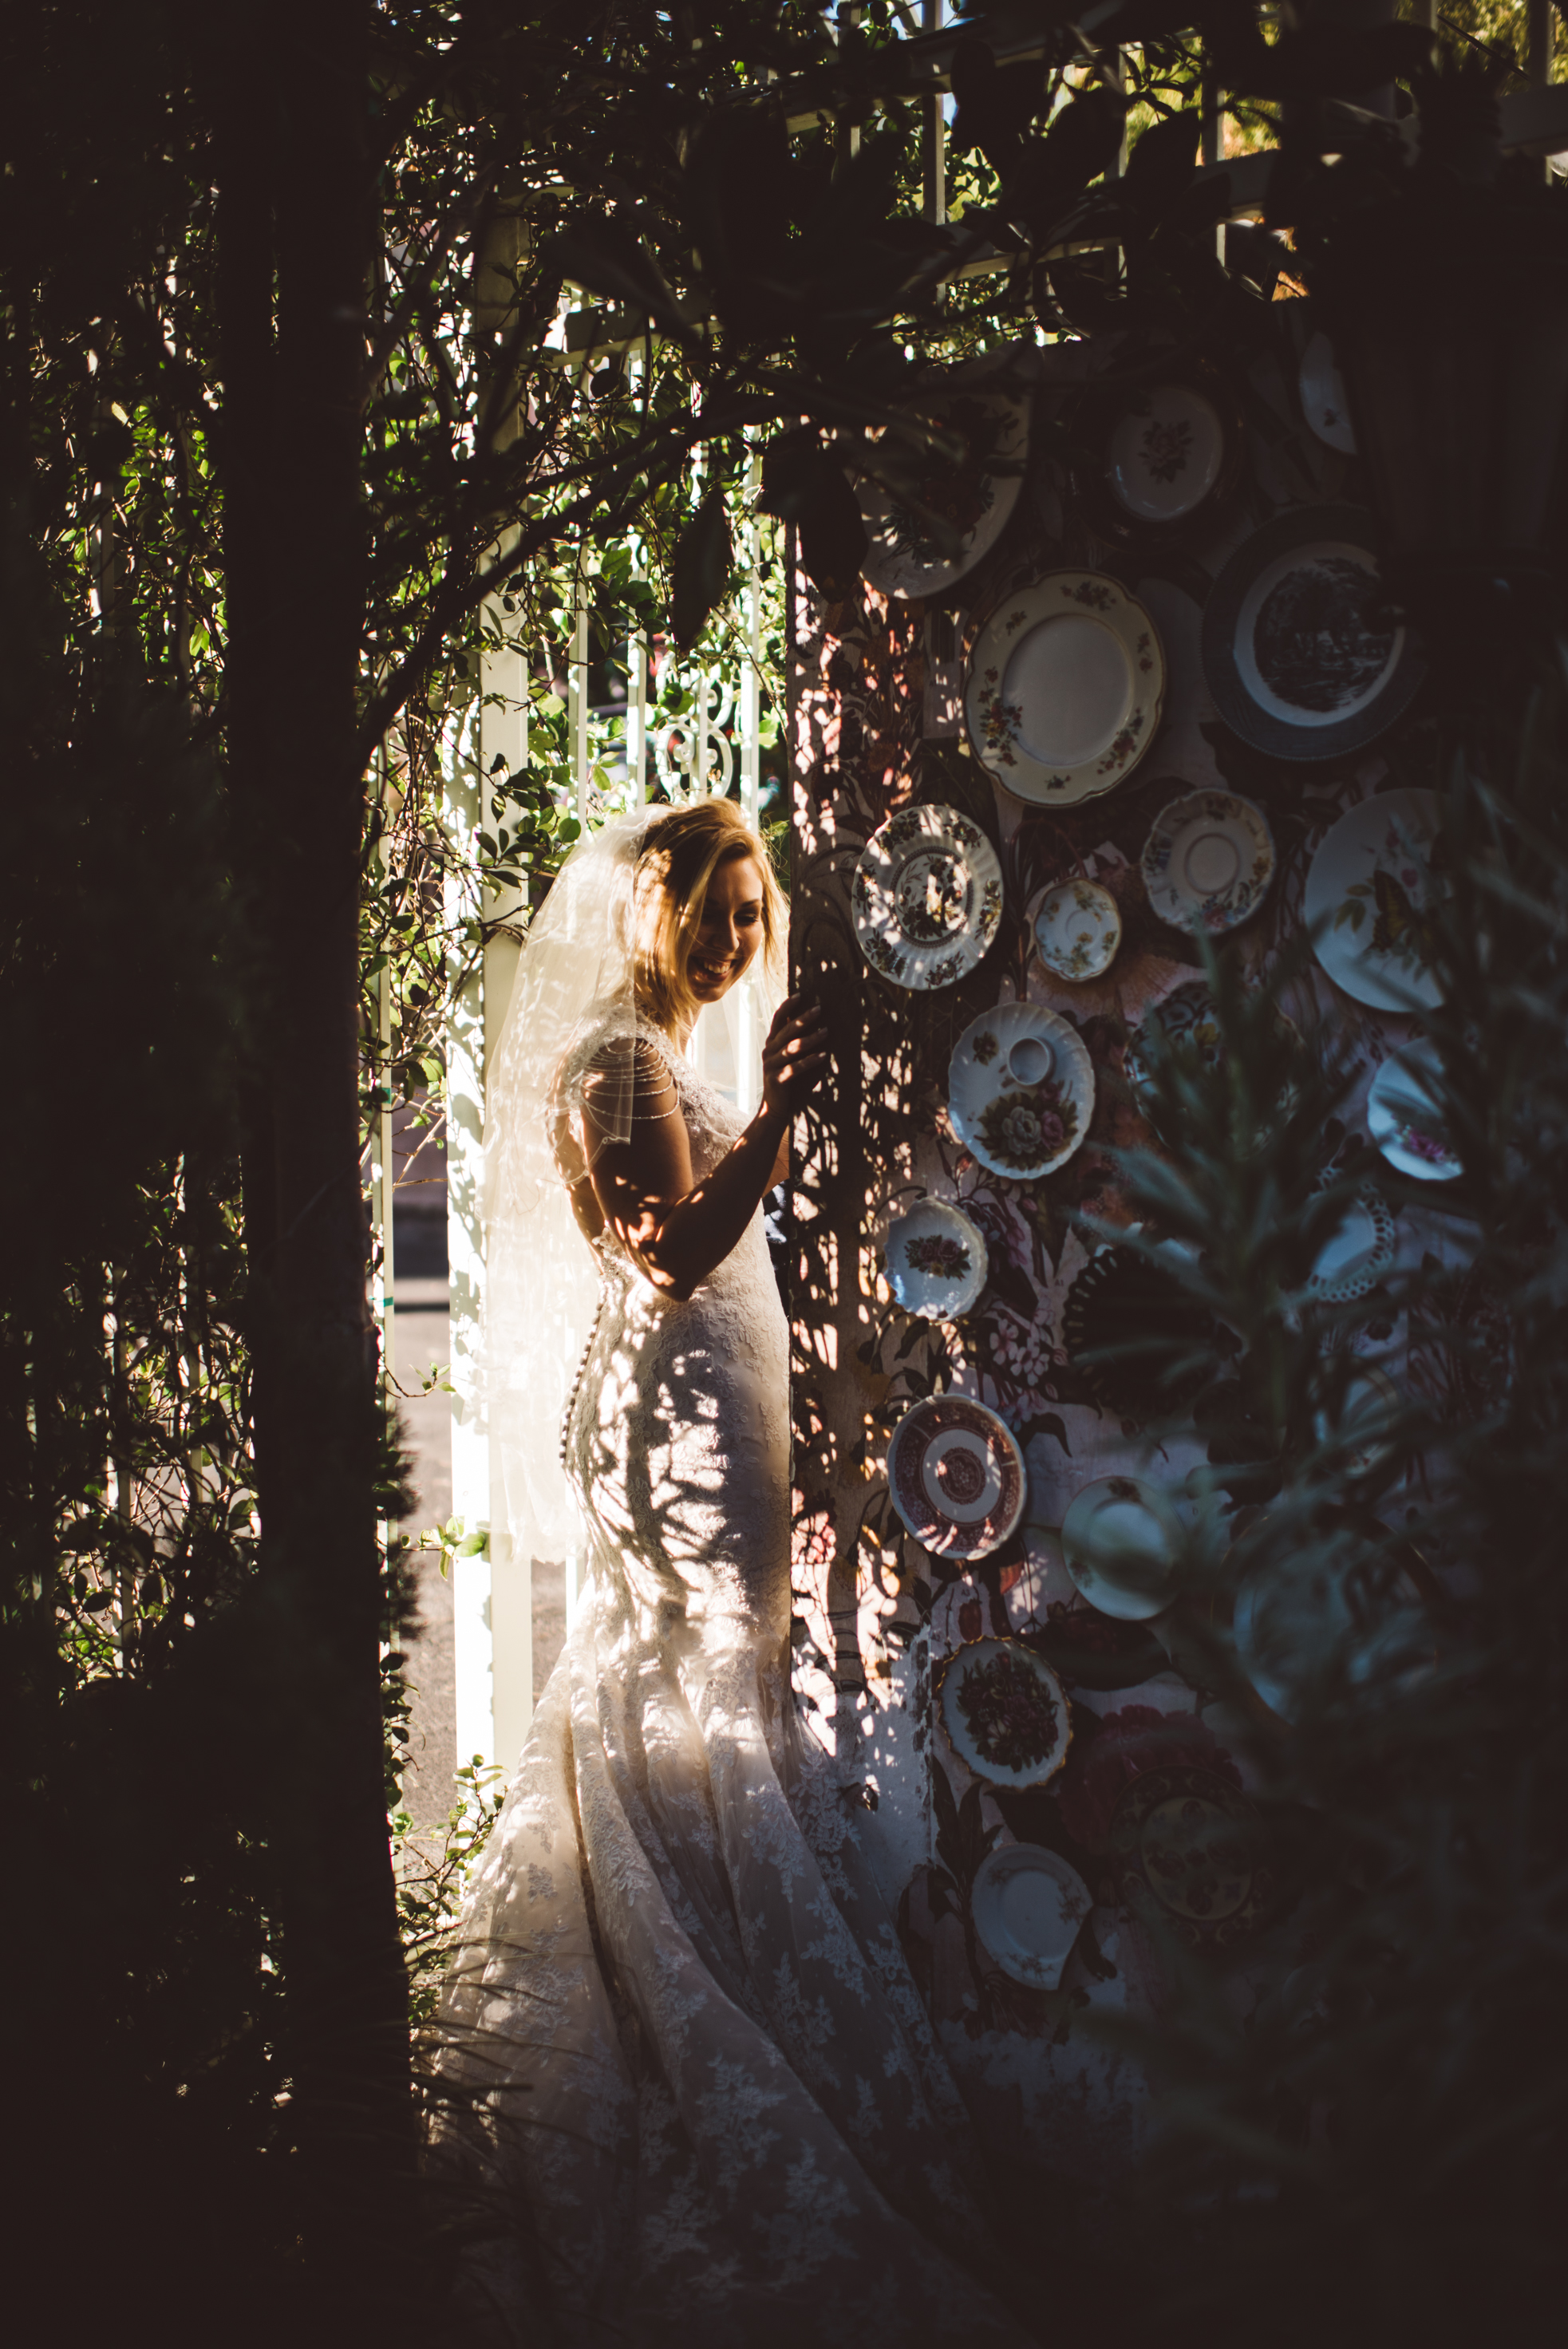 Las Vegas Elopement Photographer Ashley Marie Myers Rock'n Roll Bride-85.jpg